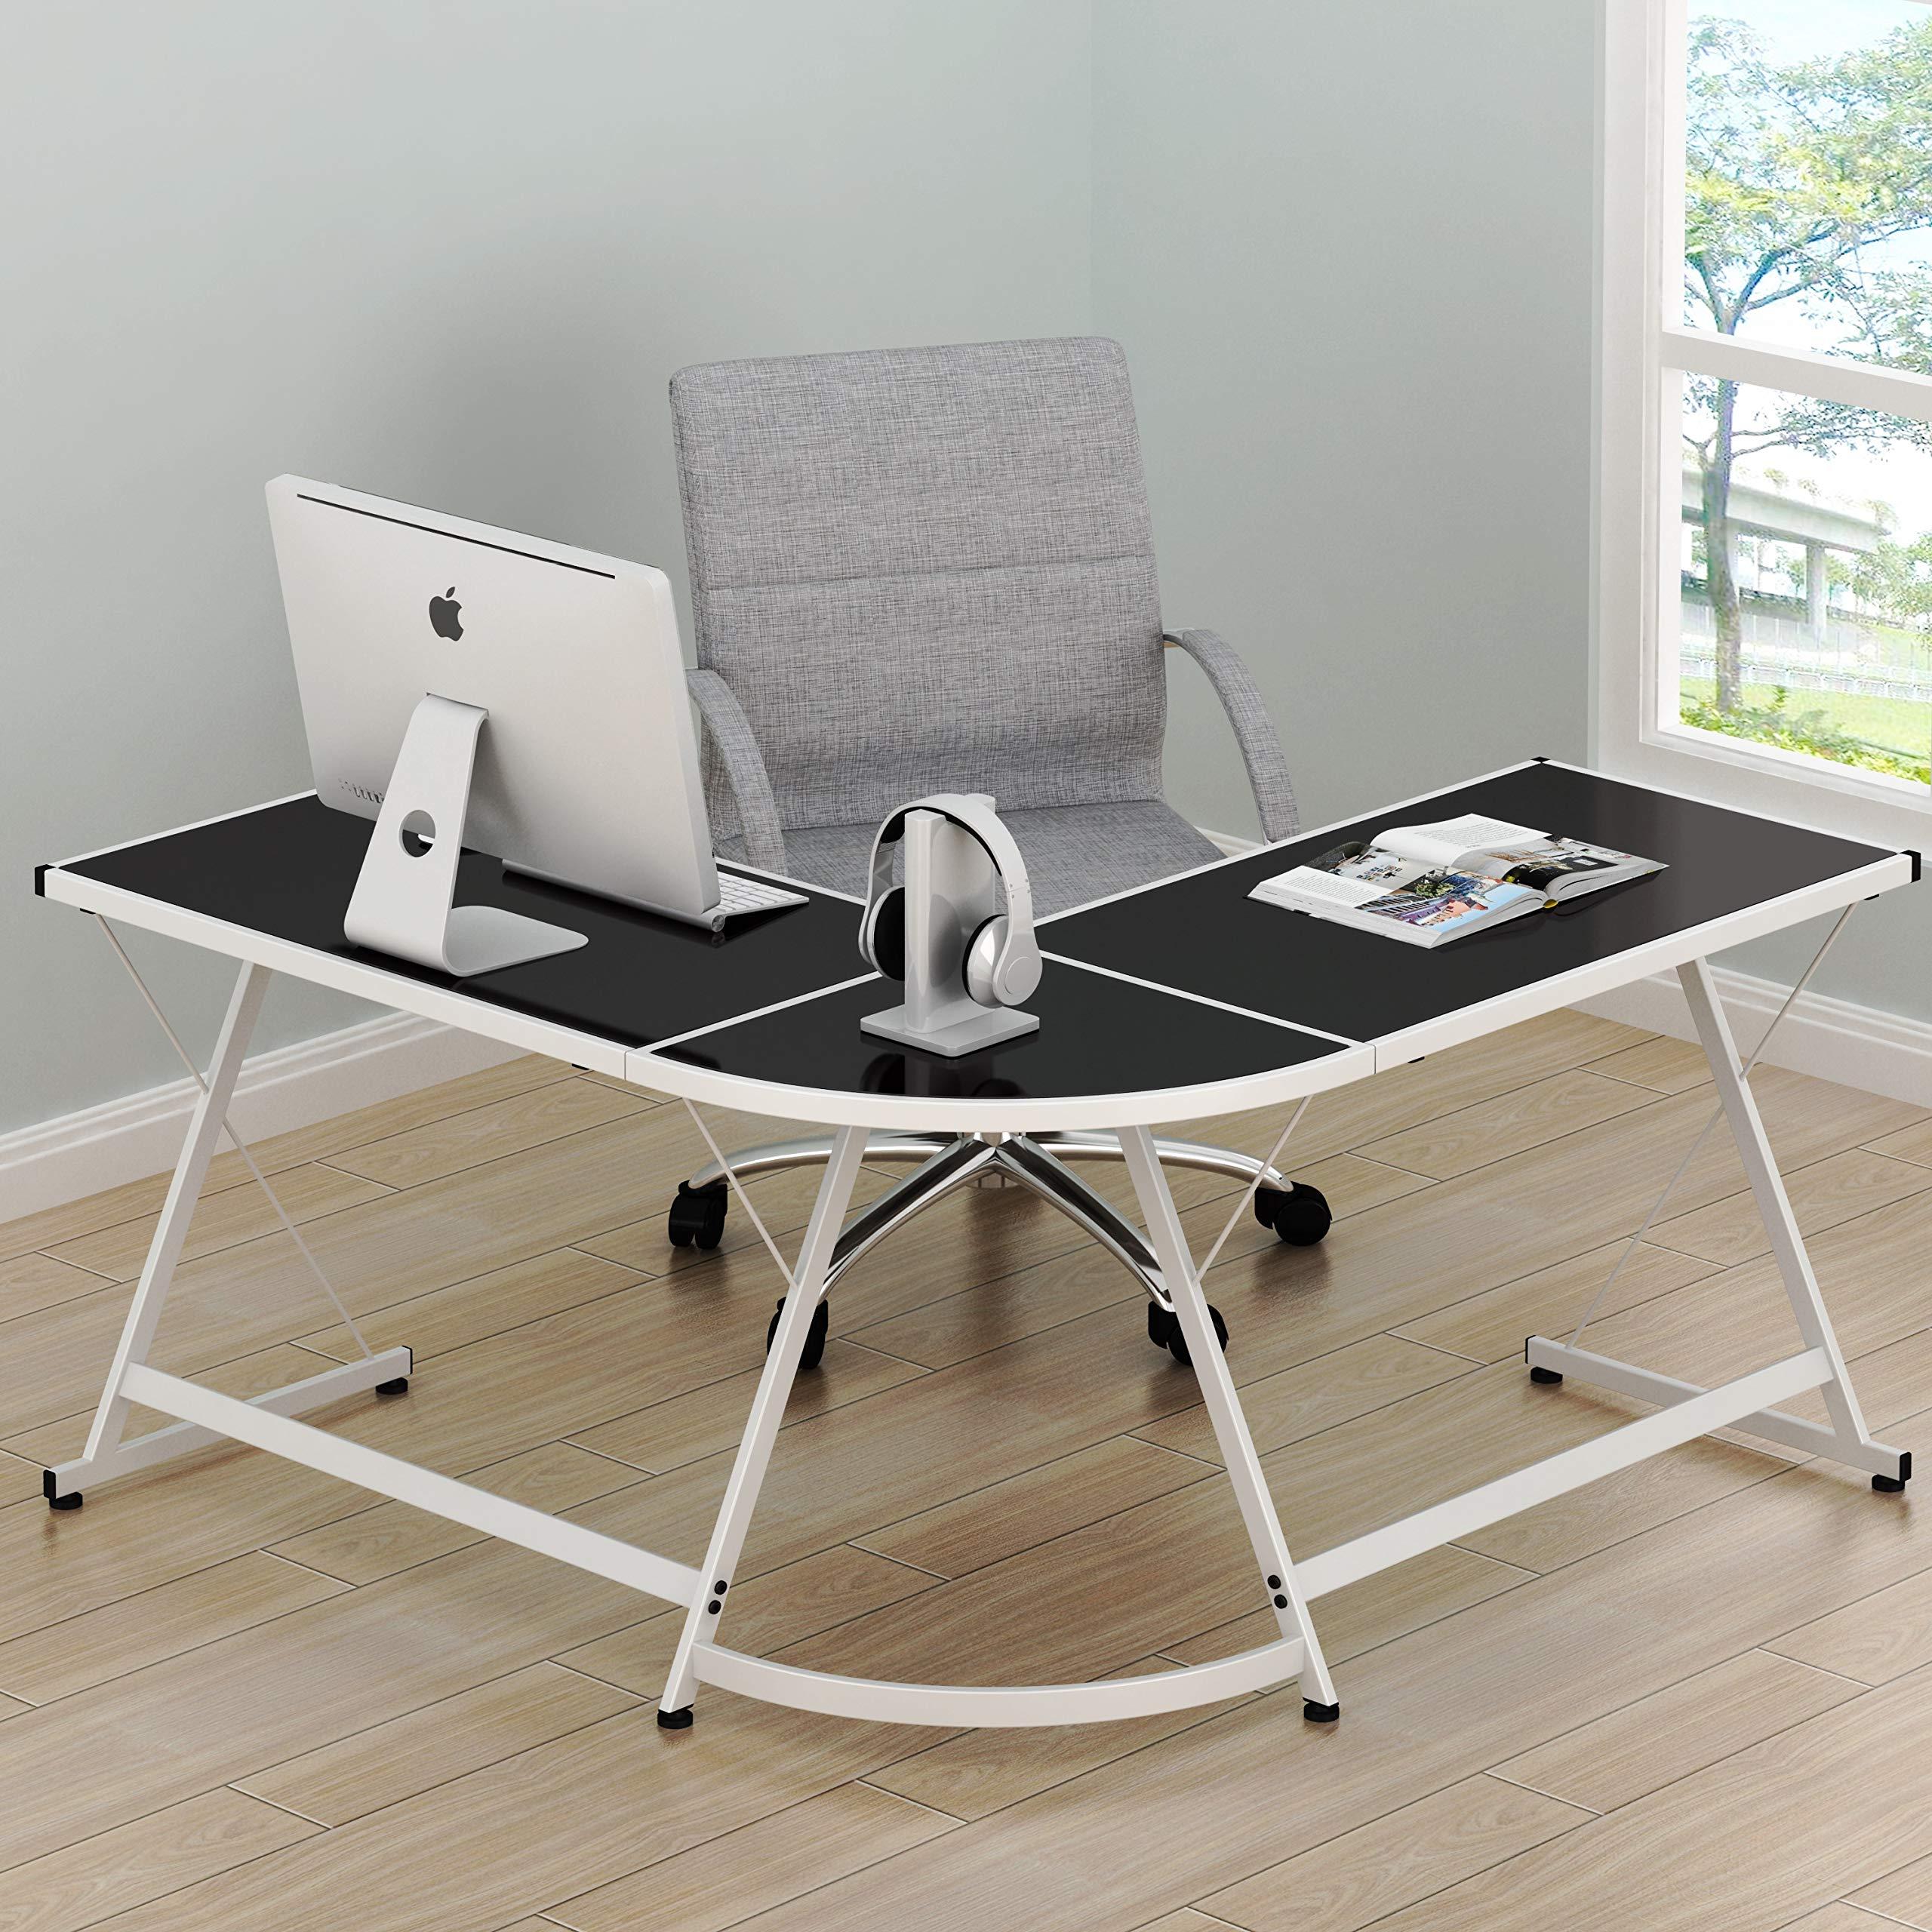 SHW Vista Corner L Desk - White with Black Glass by SHW